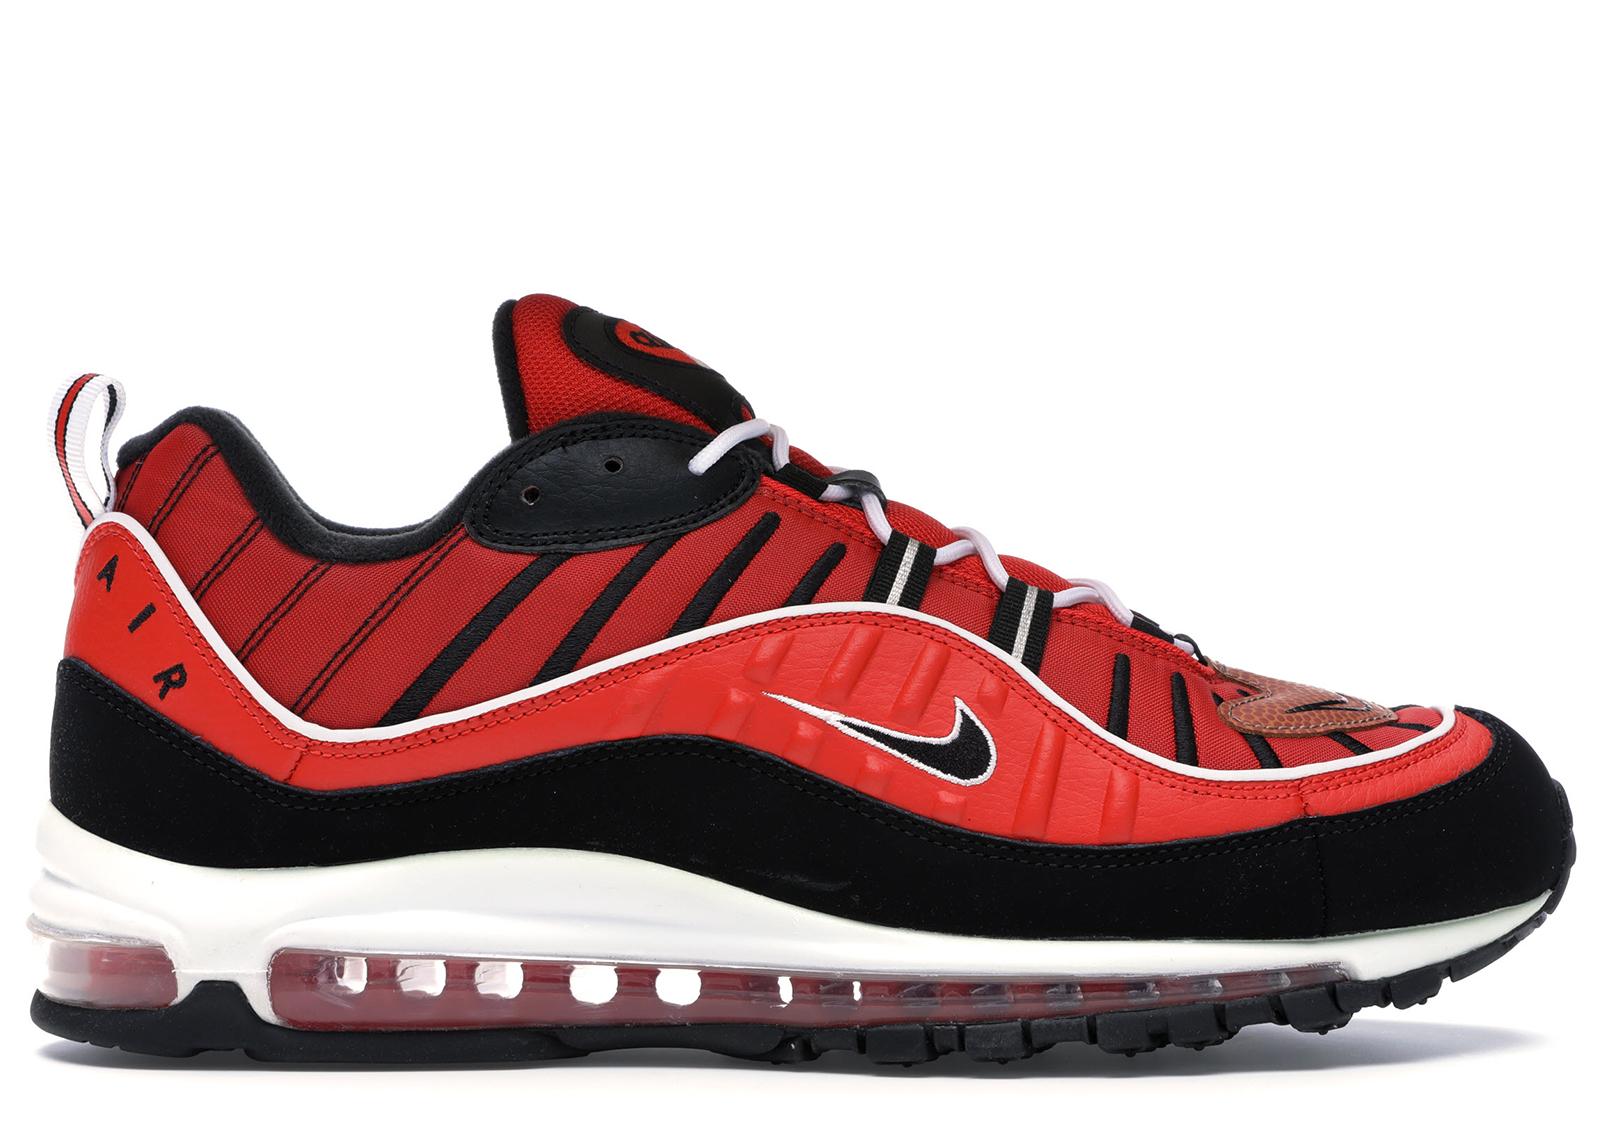 Nike Air Max 98 Habanero Red Black